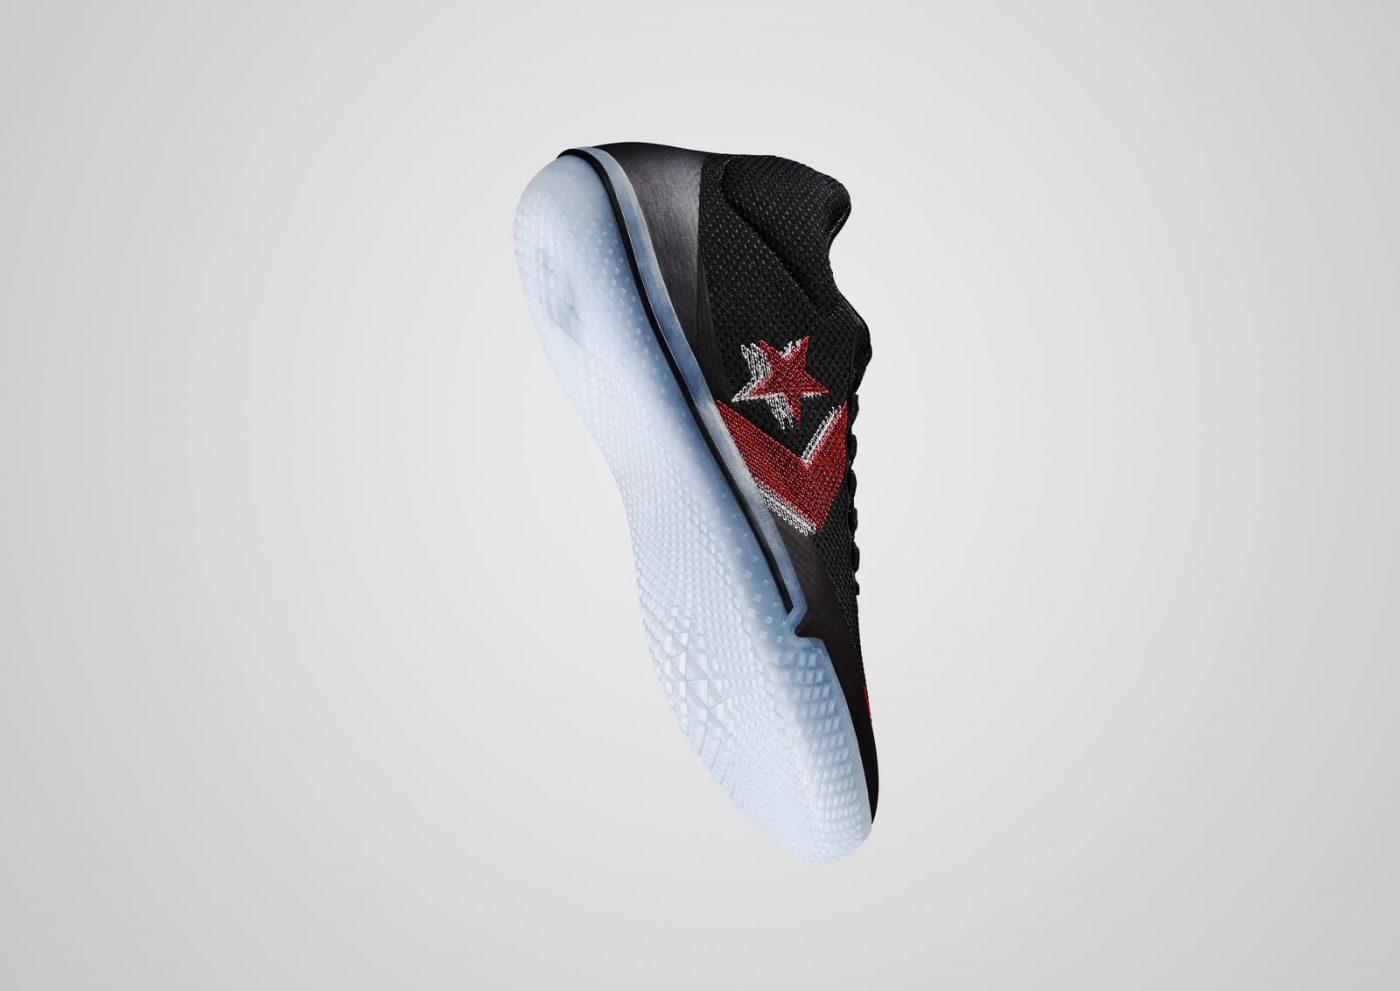 chaussures-de-basket-all-star-bb-evo-5